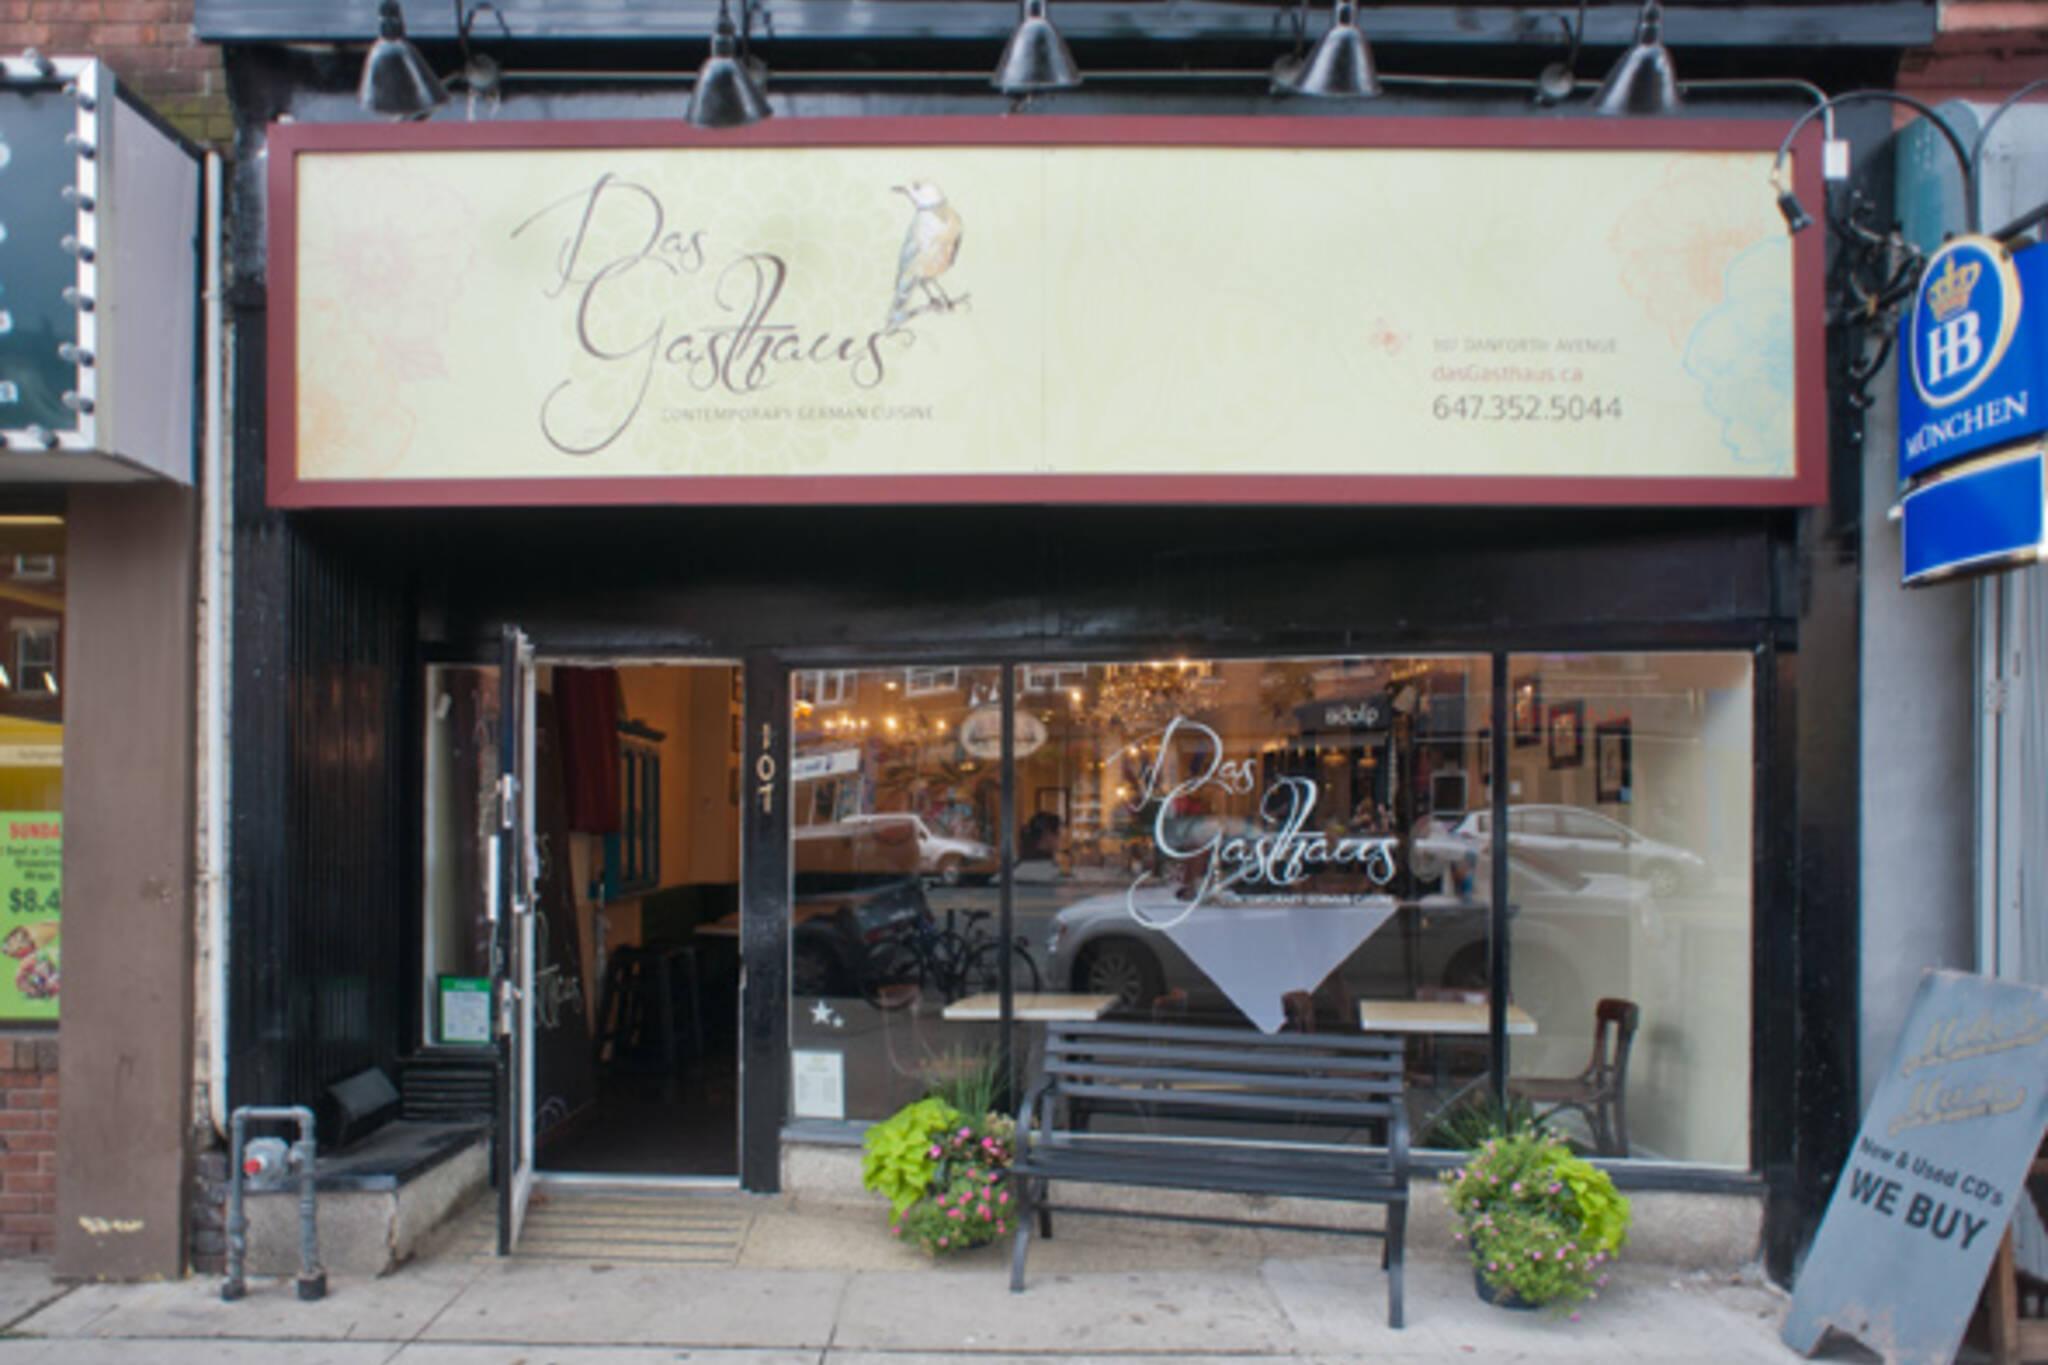 Das Gasthaus Toronto